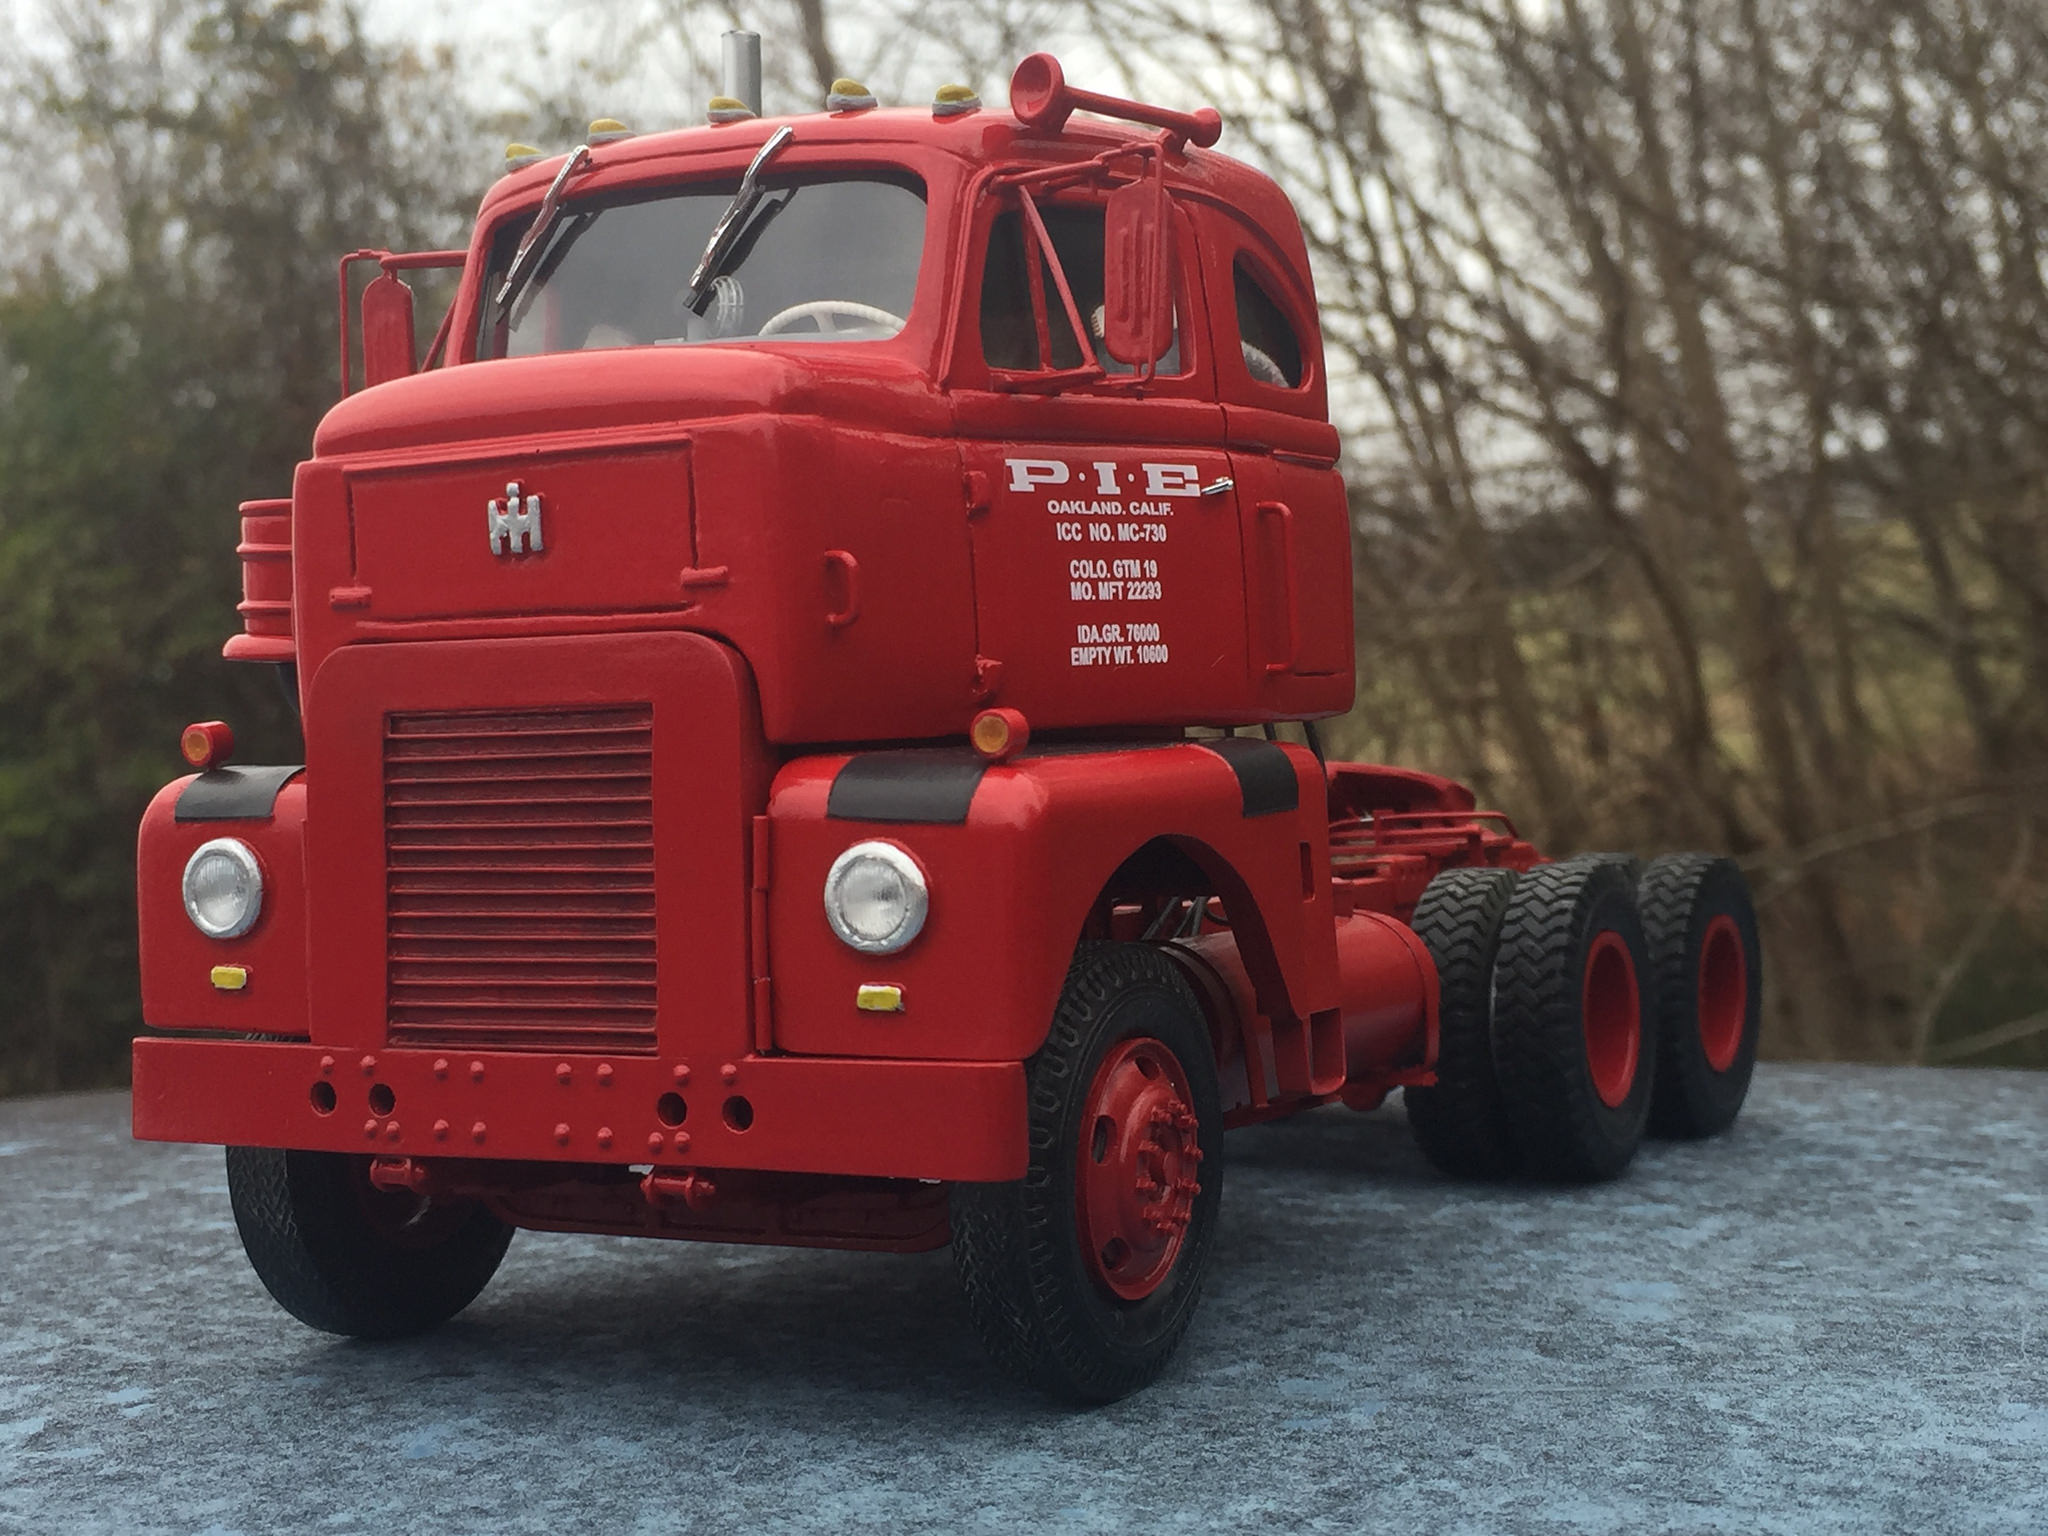 1955 IH RDTC Highbinder